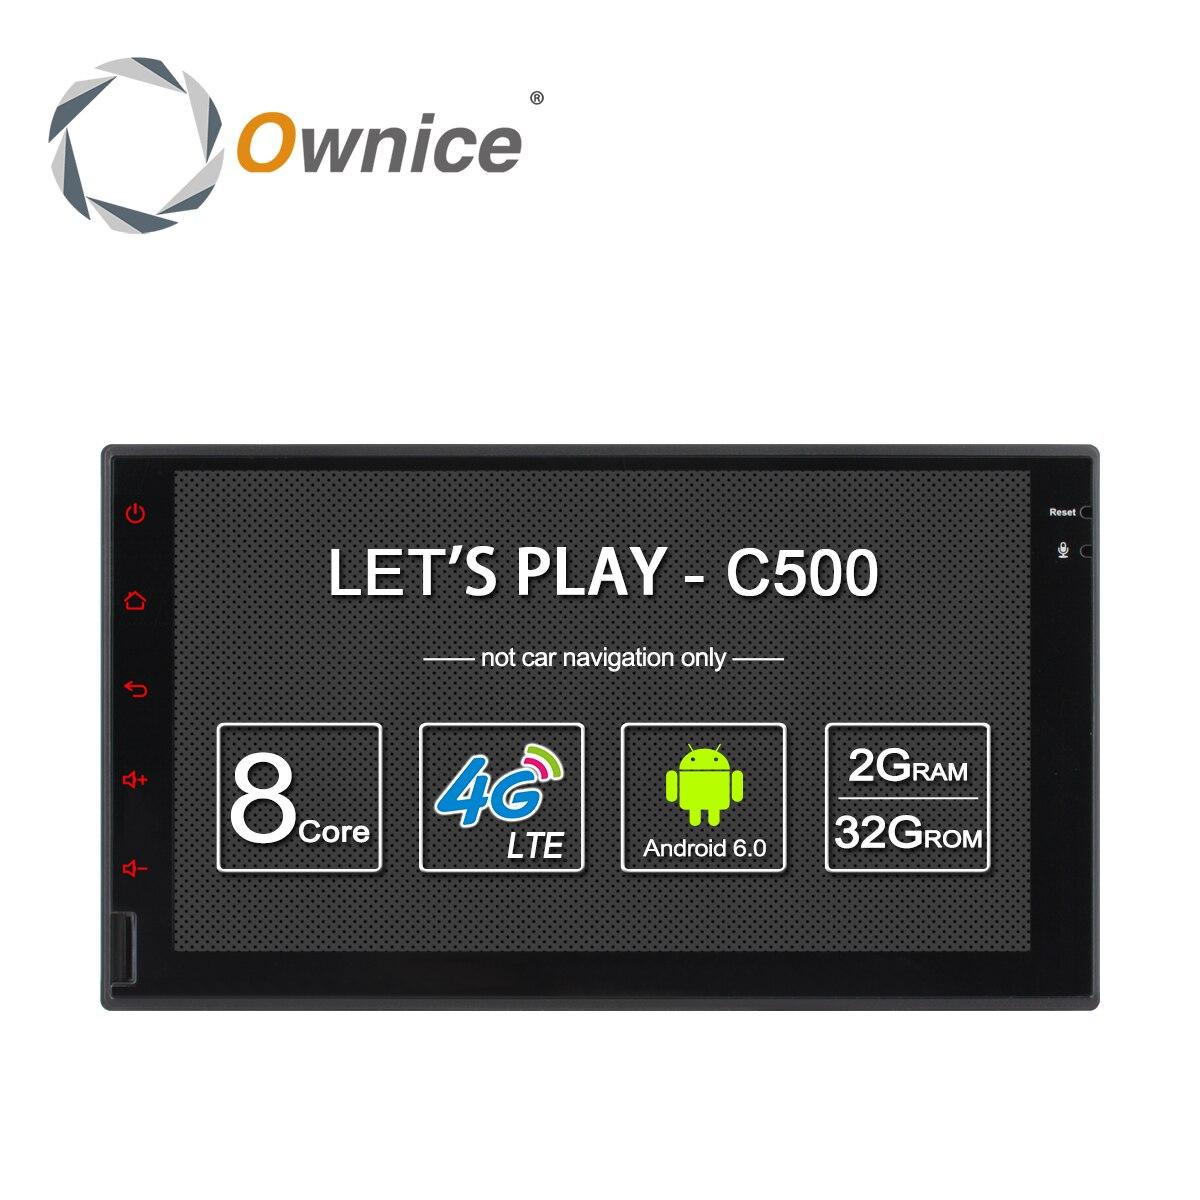 imágenes para Ownice C500 Octa 8 Core Android 6.0 2G RAM 32 GB ROM Soporte 4G Red LTE SIM GPS 2 din Universal de coches reproductor de dvd de Radio Del Coche